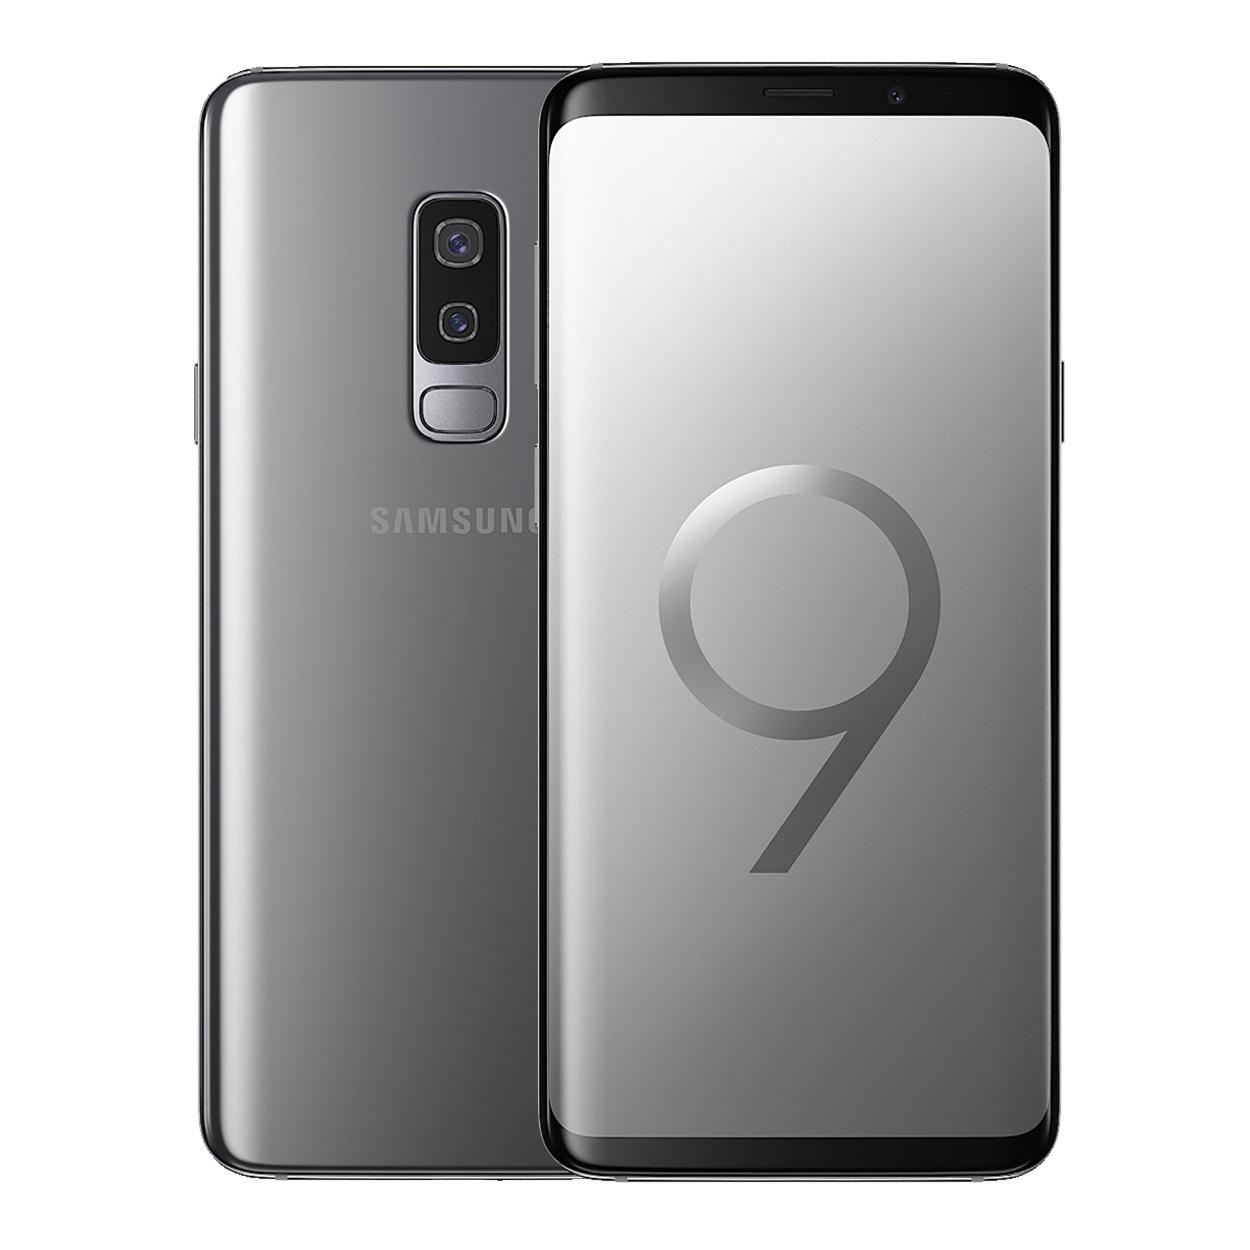 samsung galaxy s9 plus smart phone 6 2 6gb ram 256gb 12mp 8mp 4g lte titanium gray blink. Black Bedroom Furniture Sets. Home Design Ideas